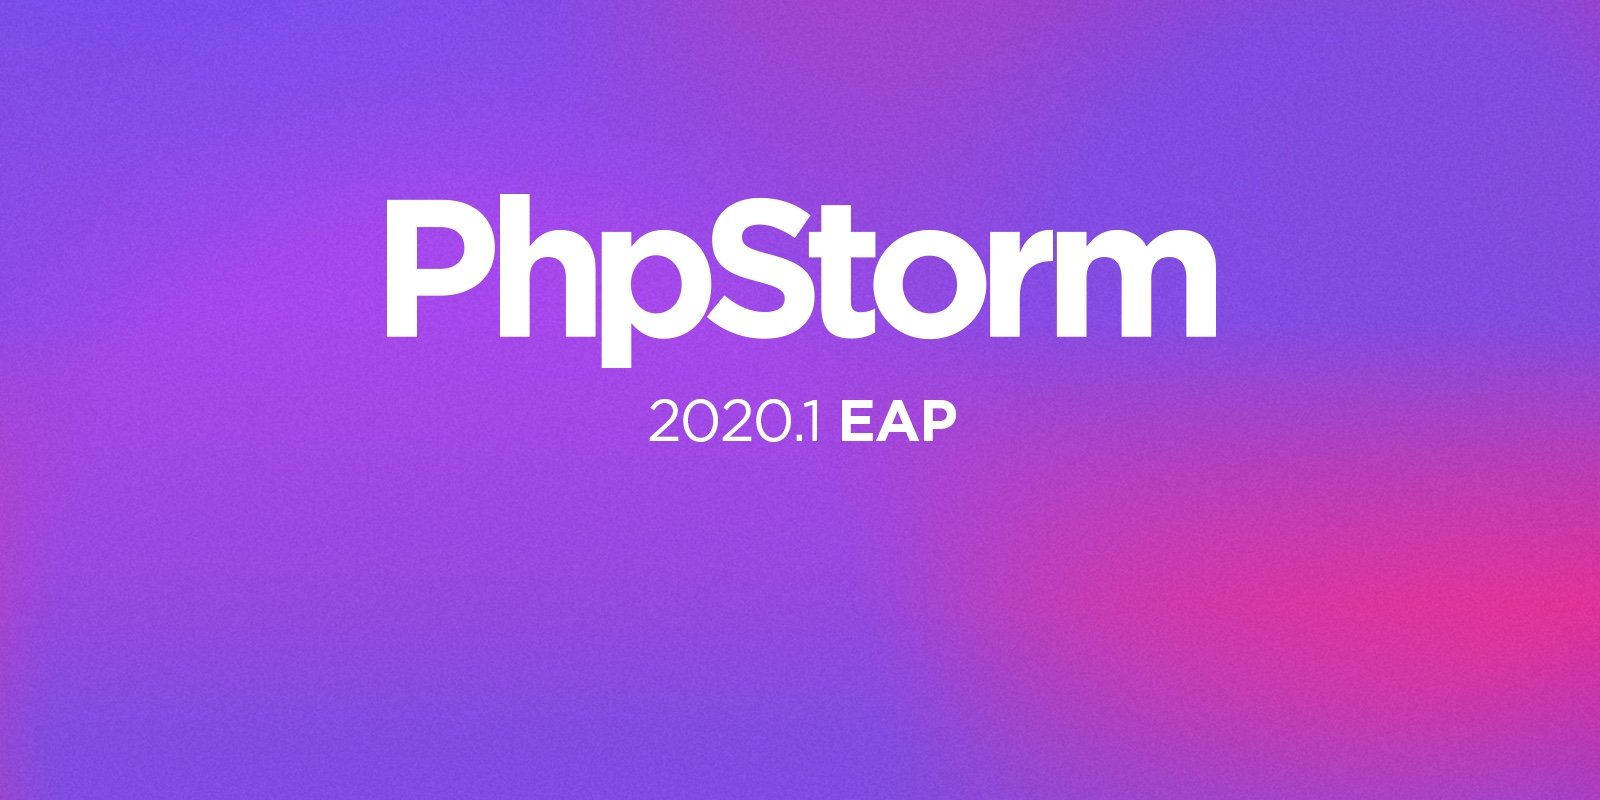 PhpStorm 2020.1 EAP